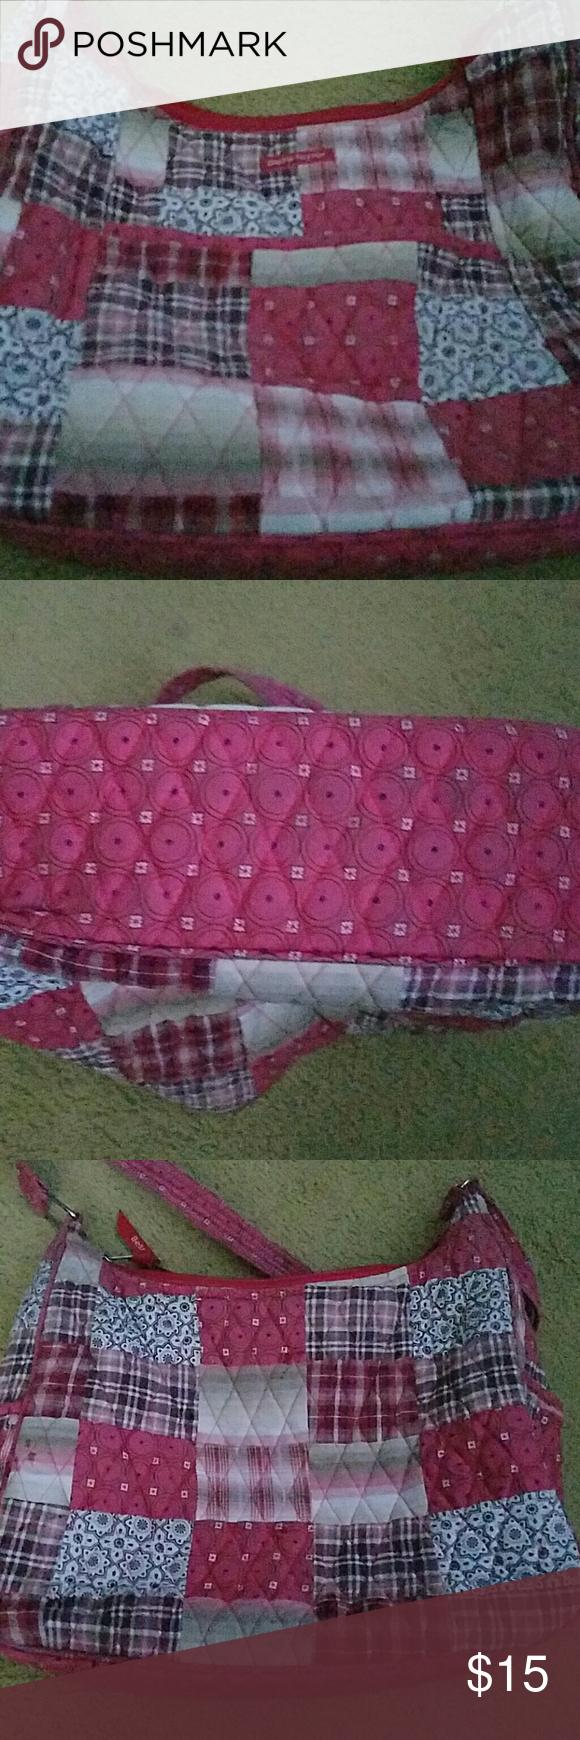 Bella Taylor patchwork purse Used Bella Taylor purse. Has some wear to it. Bella Taylor Bags Shoulder Bags